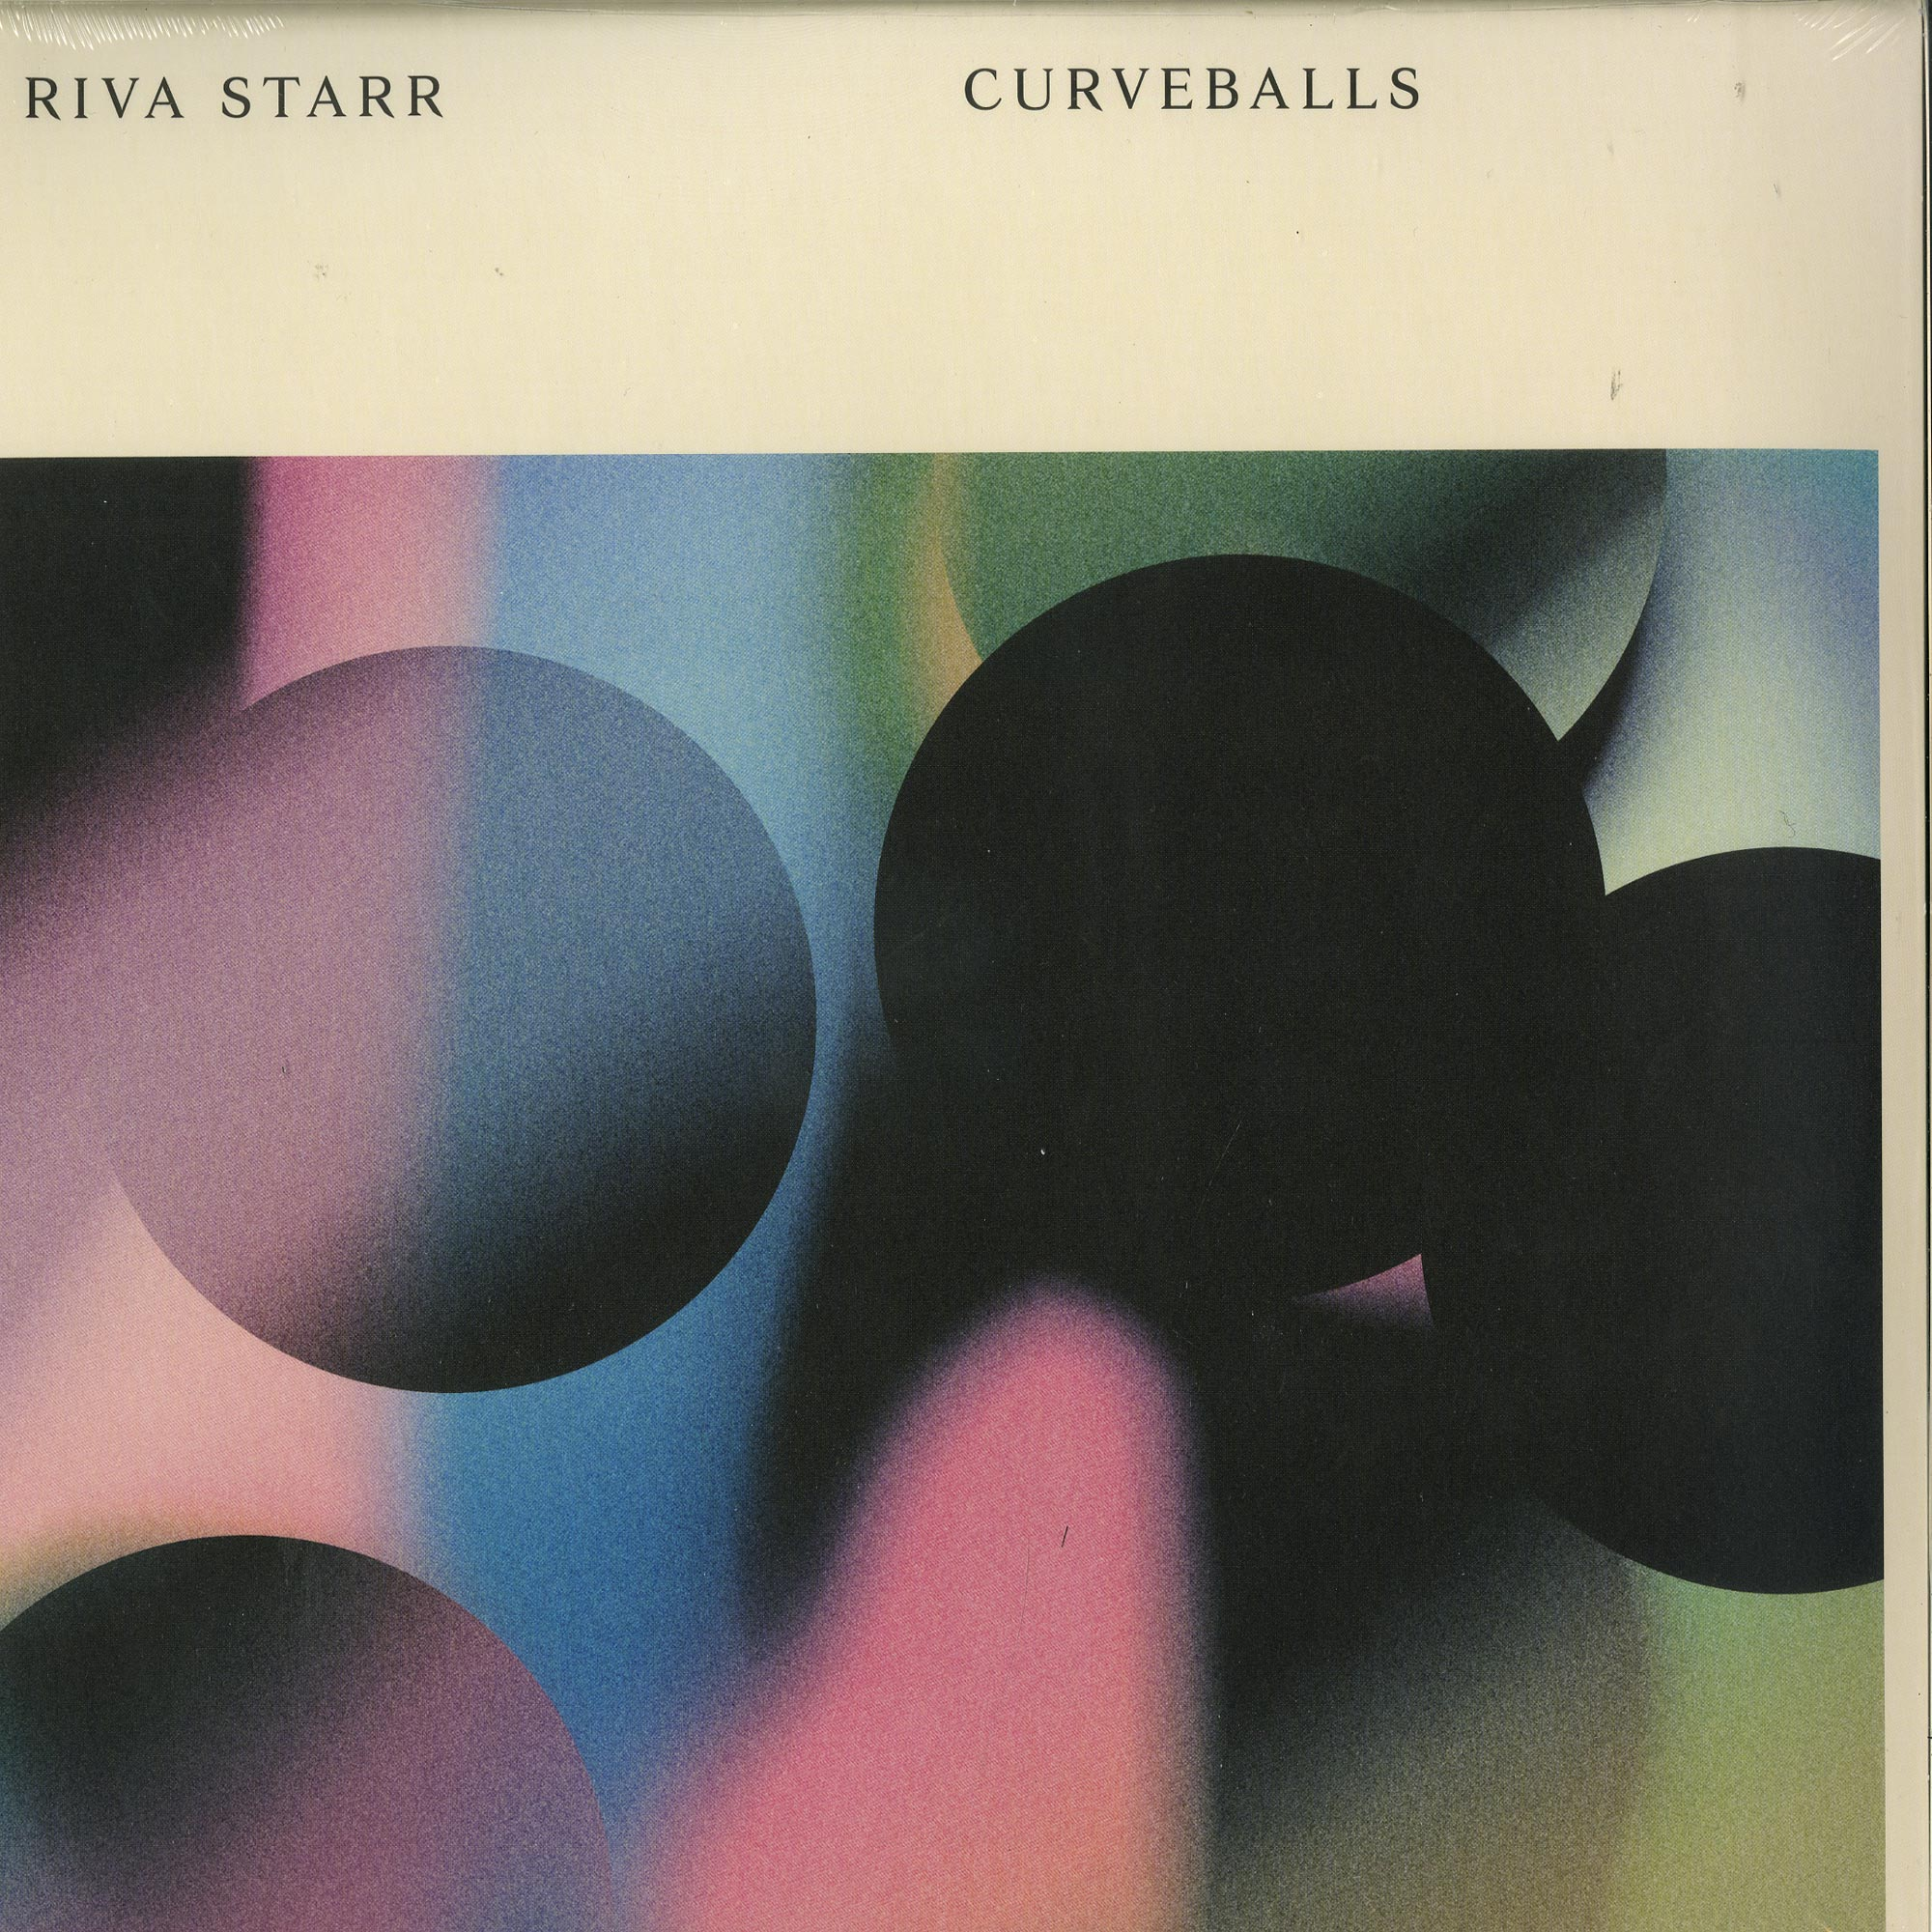 Riva Starr - CURVEBALLS